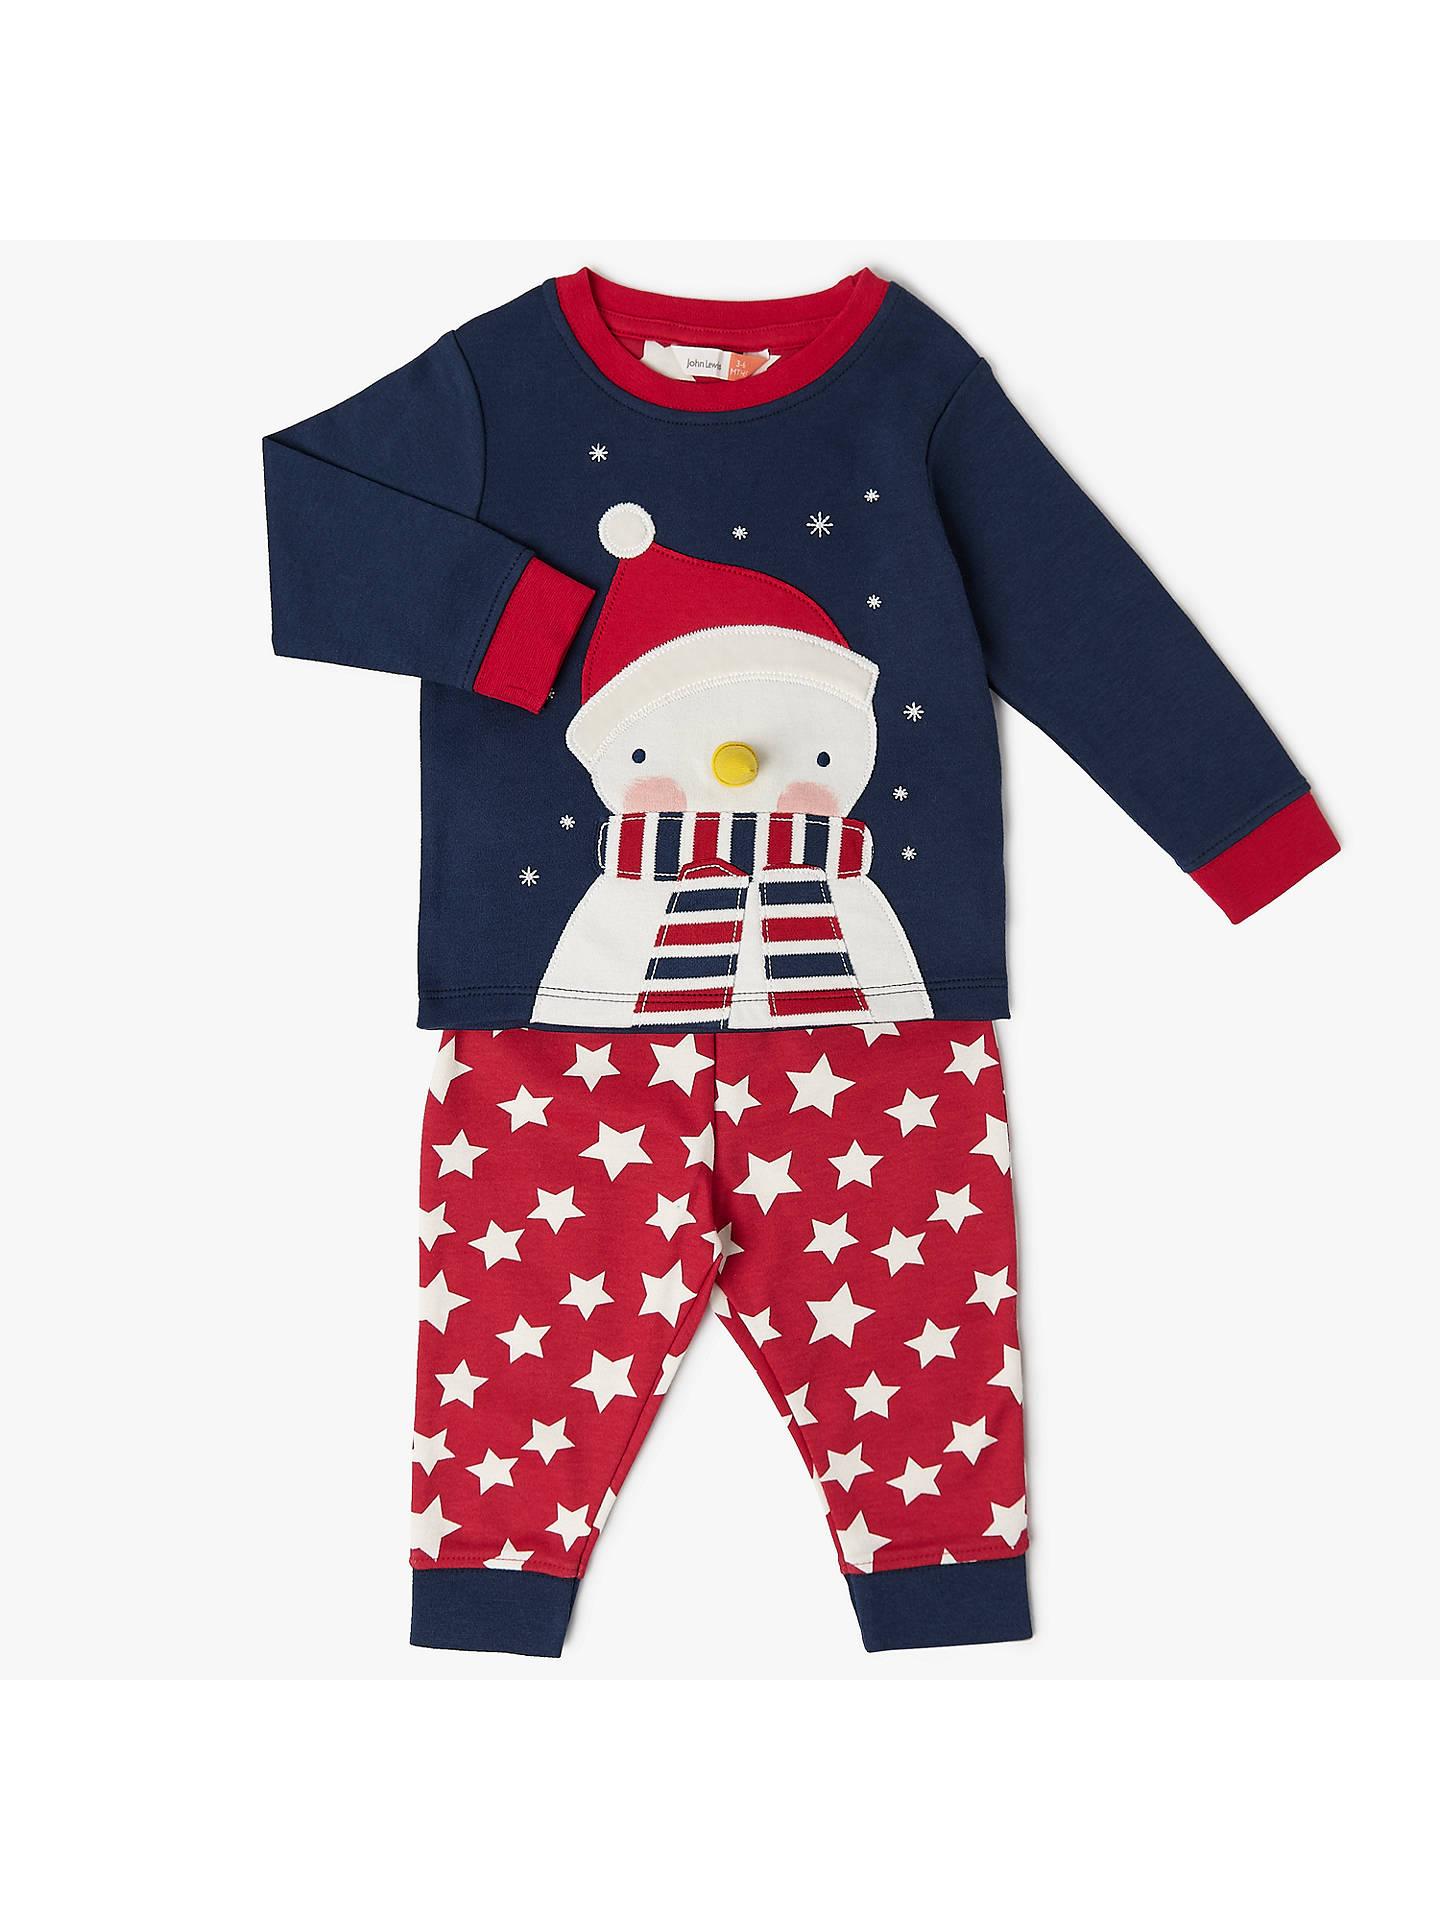 00f69c86d10a8 Buy John Lewis Baby Christmas Snowman Pyjamas